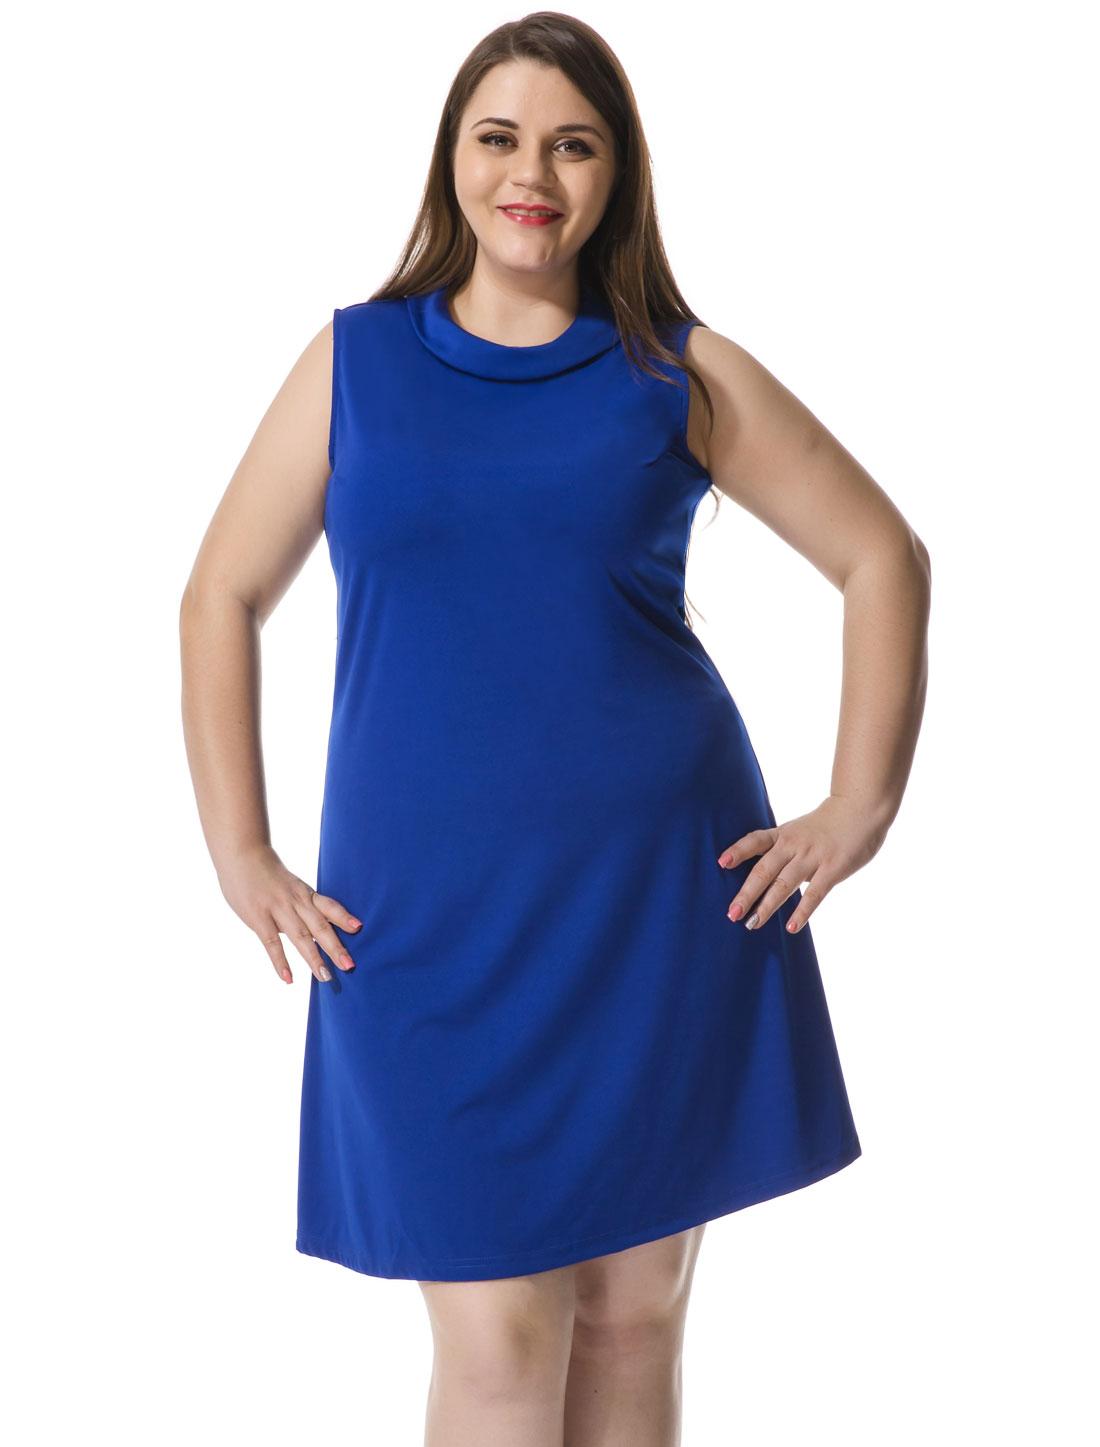 Women Plus Size Turn Down Collar Sleeveless Dress Blue 2X